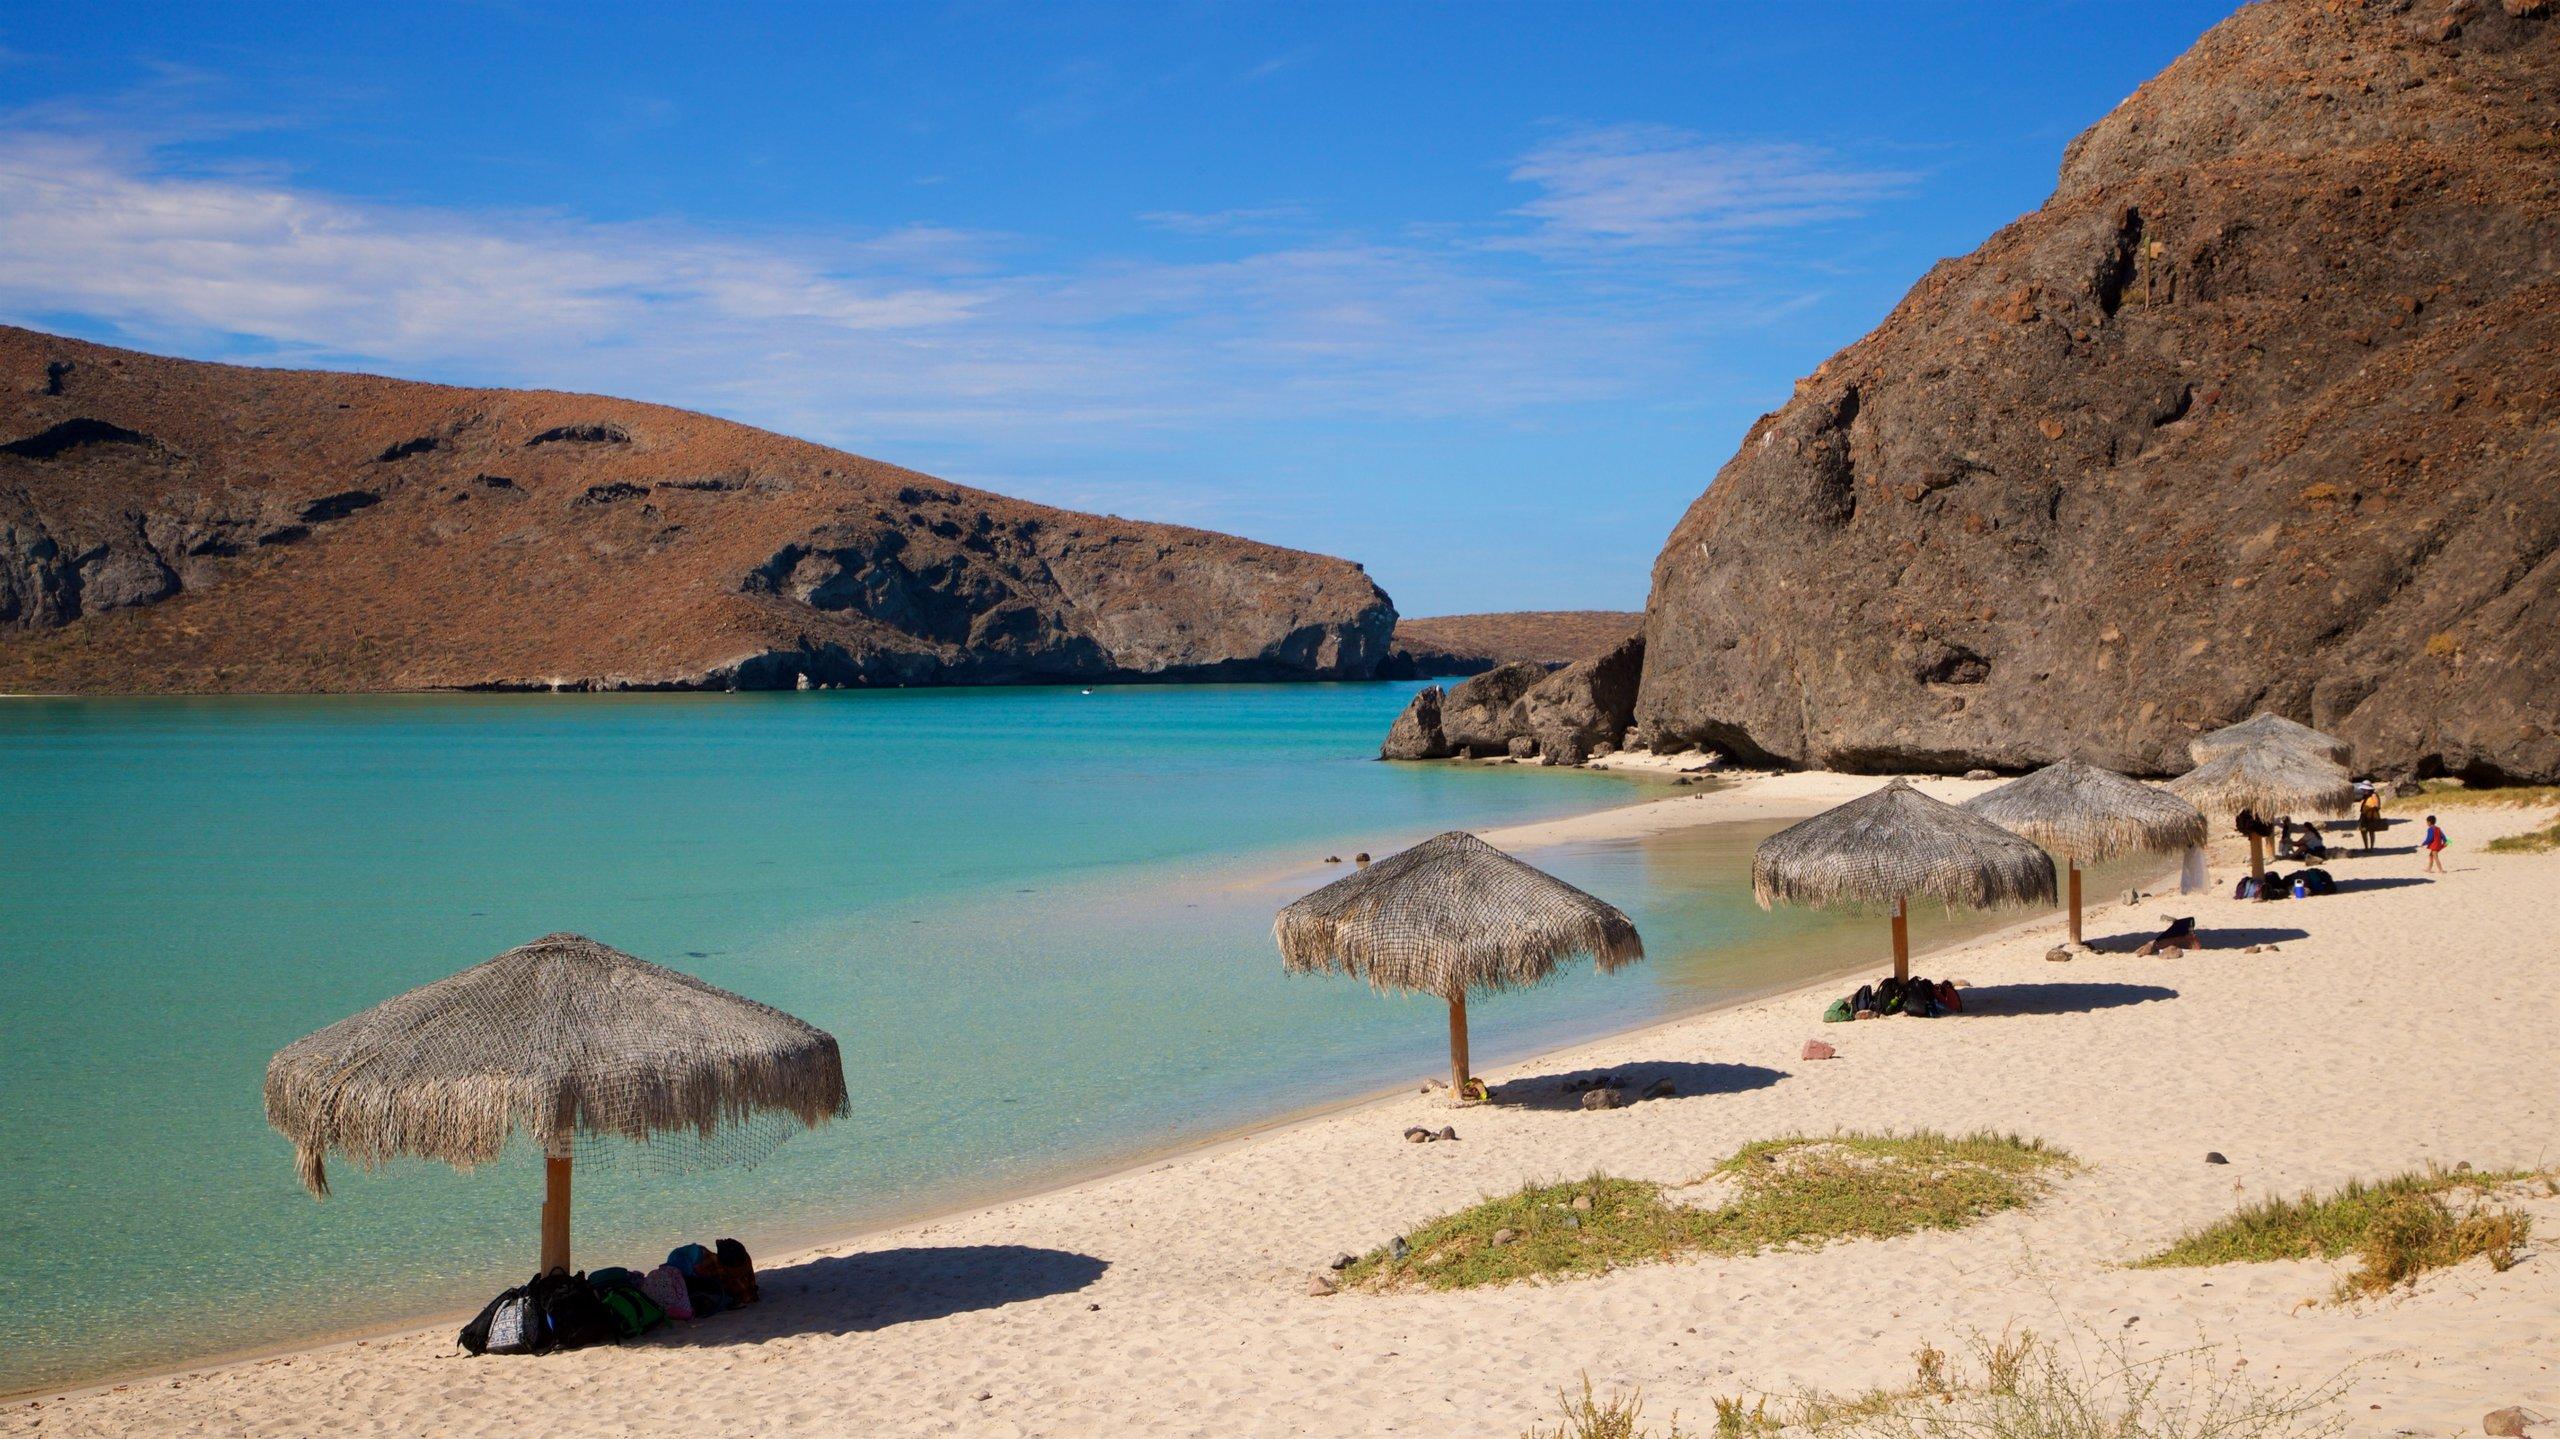 La Paz, Baja California Sur/Süden der Baja California, Mexiko